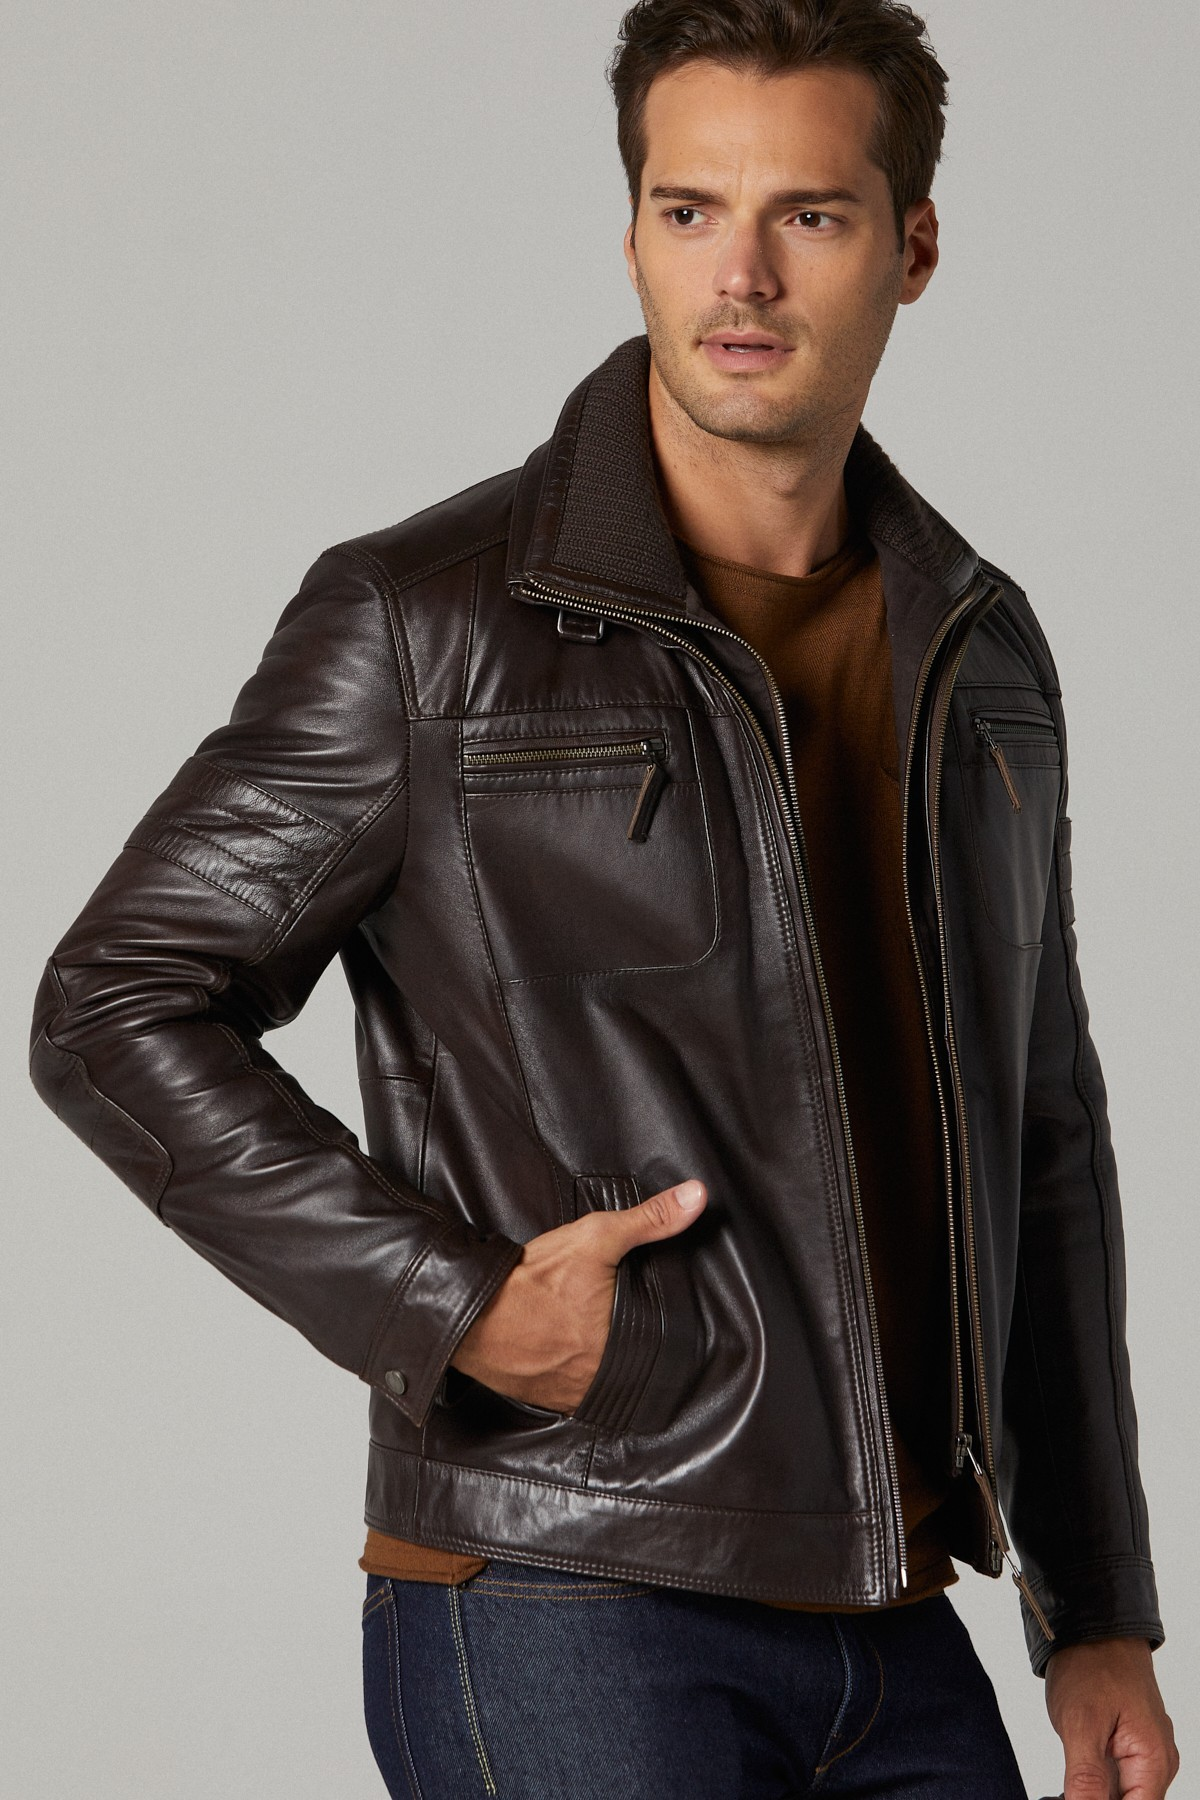 Dockers Mens Leather Jacket